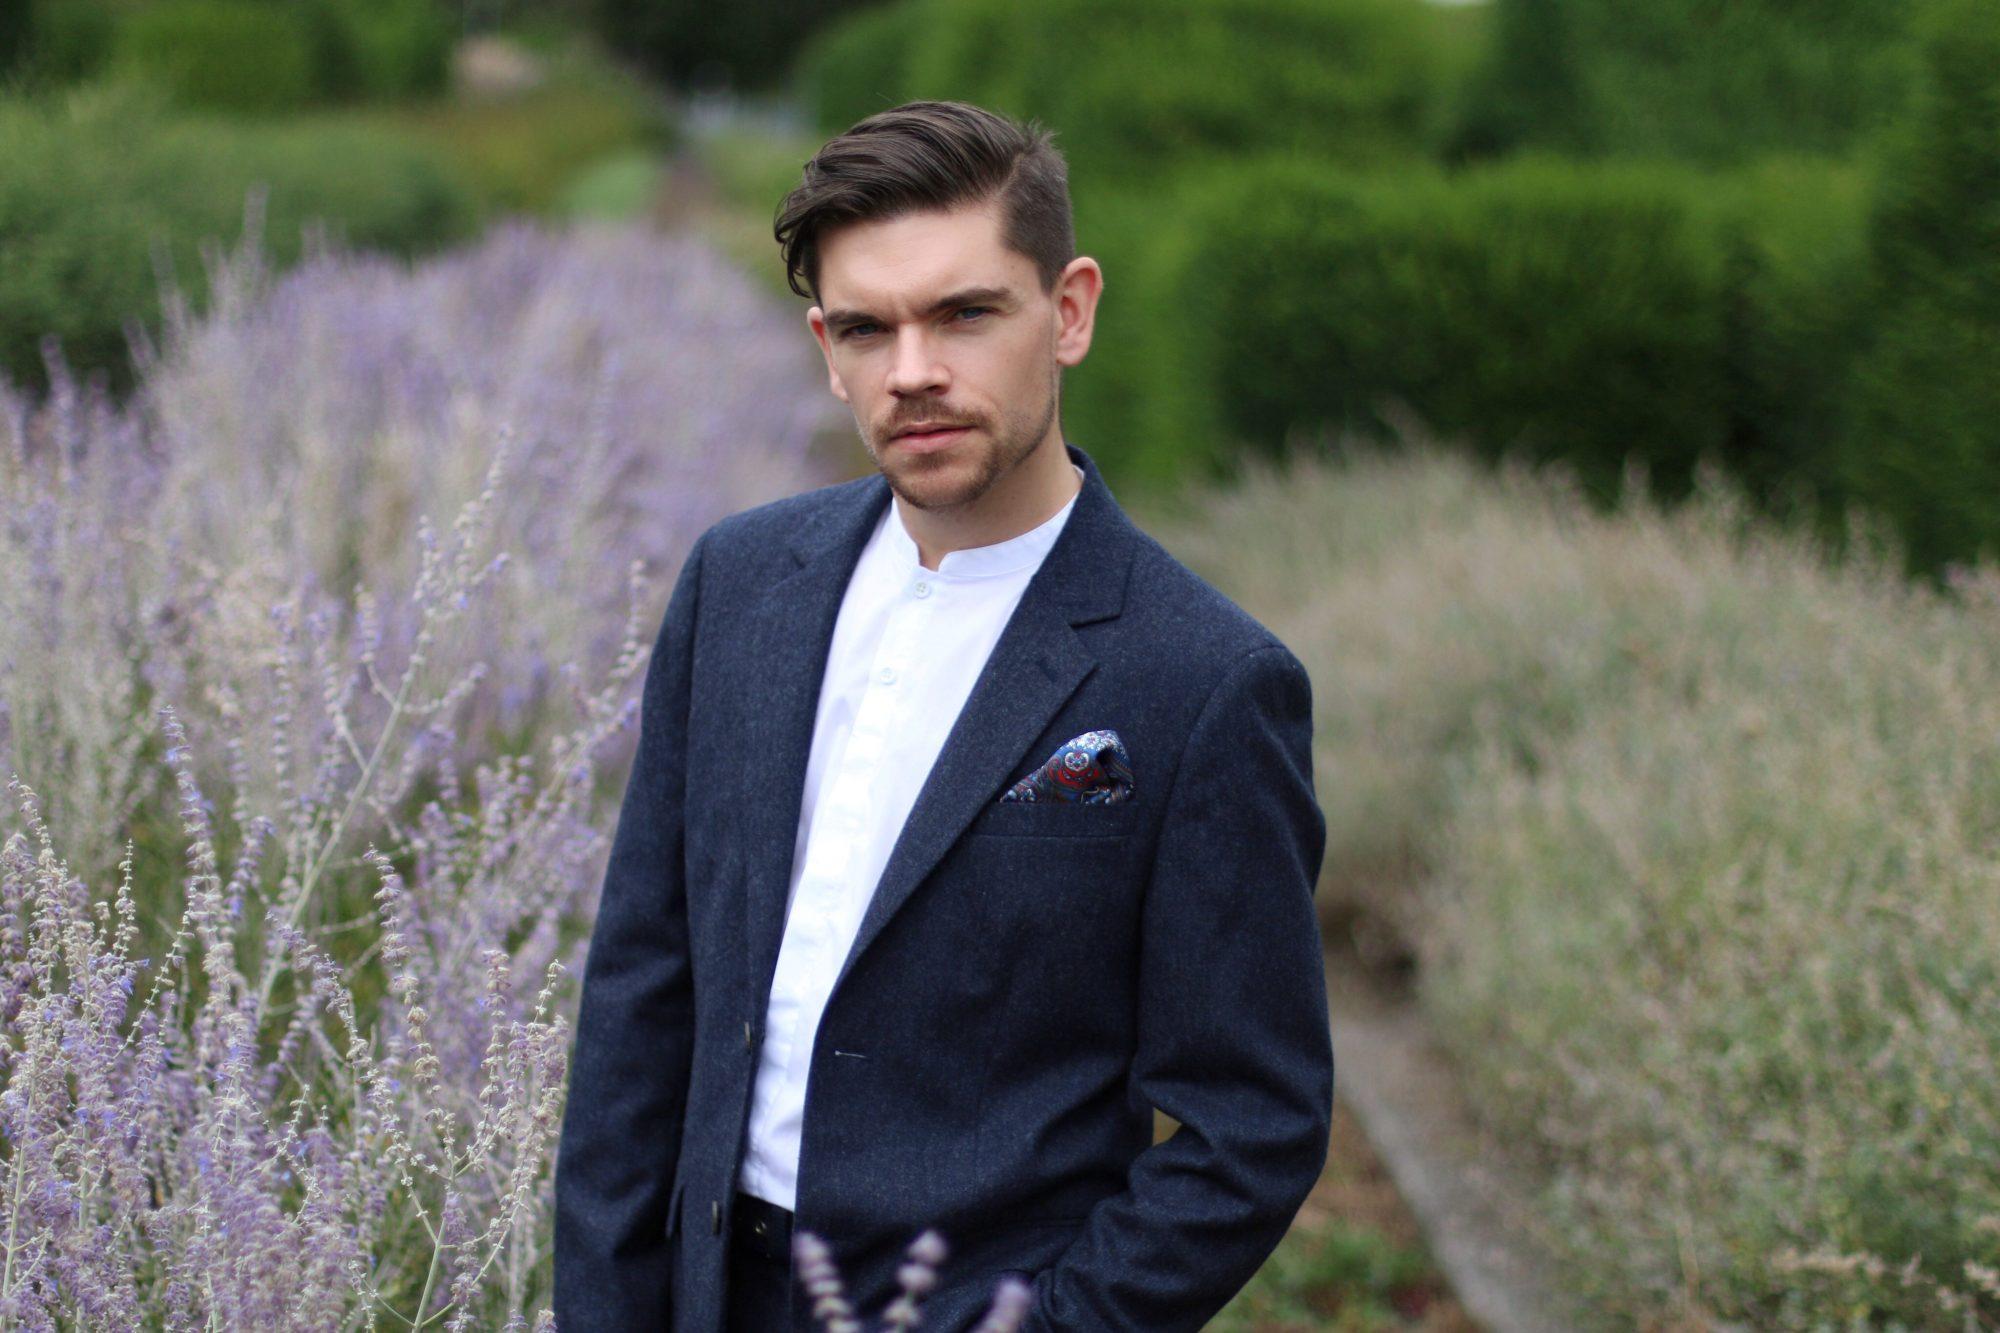 Man For Himself Jack Wills Bloomsbury Suit